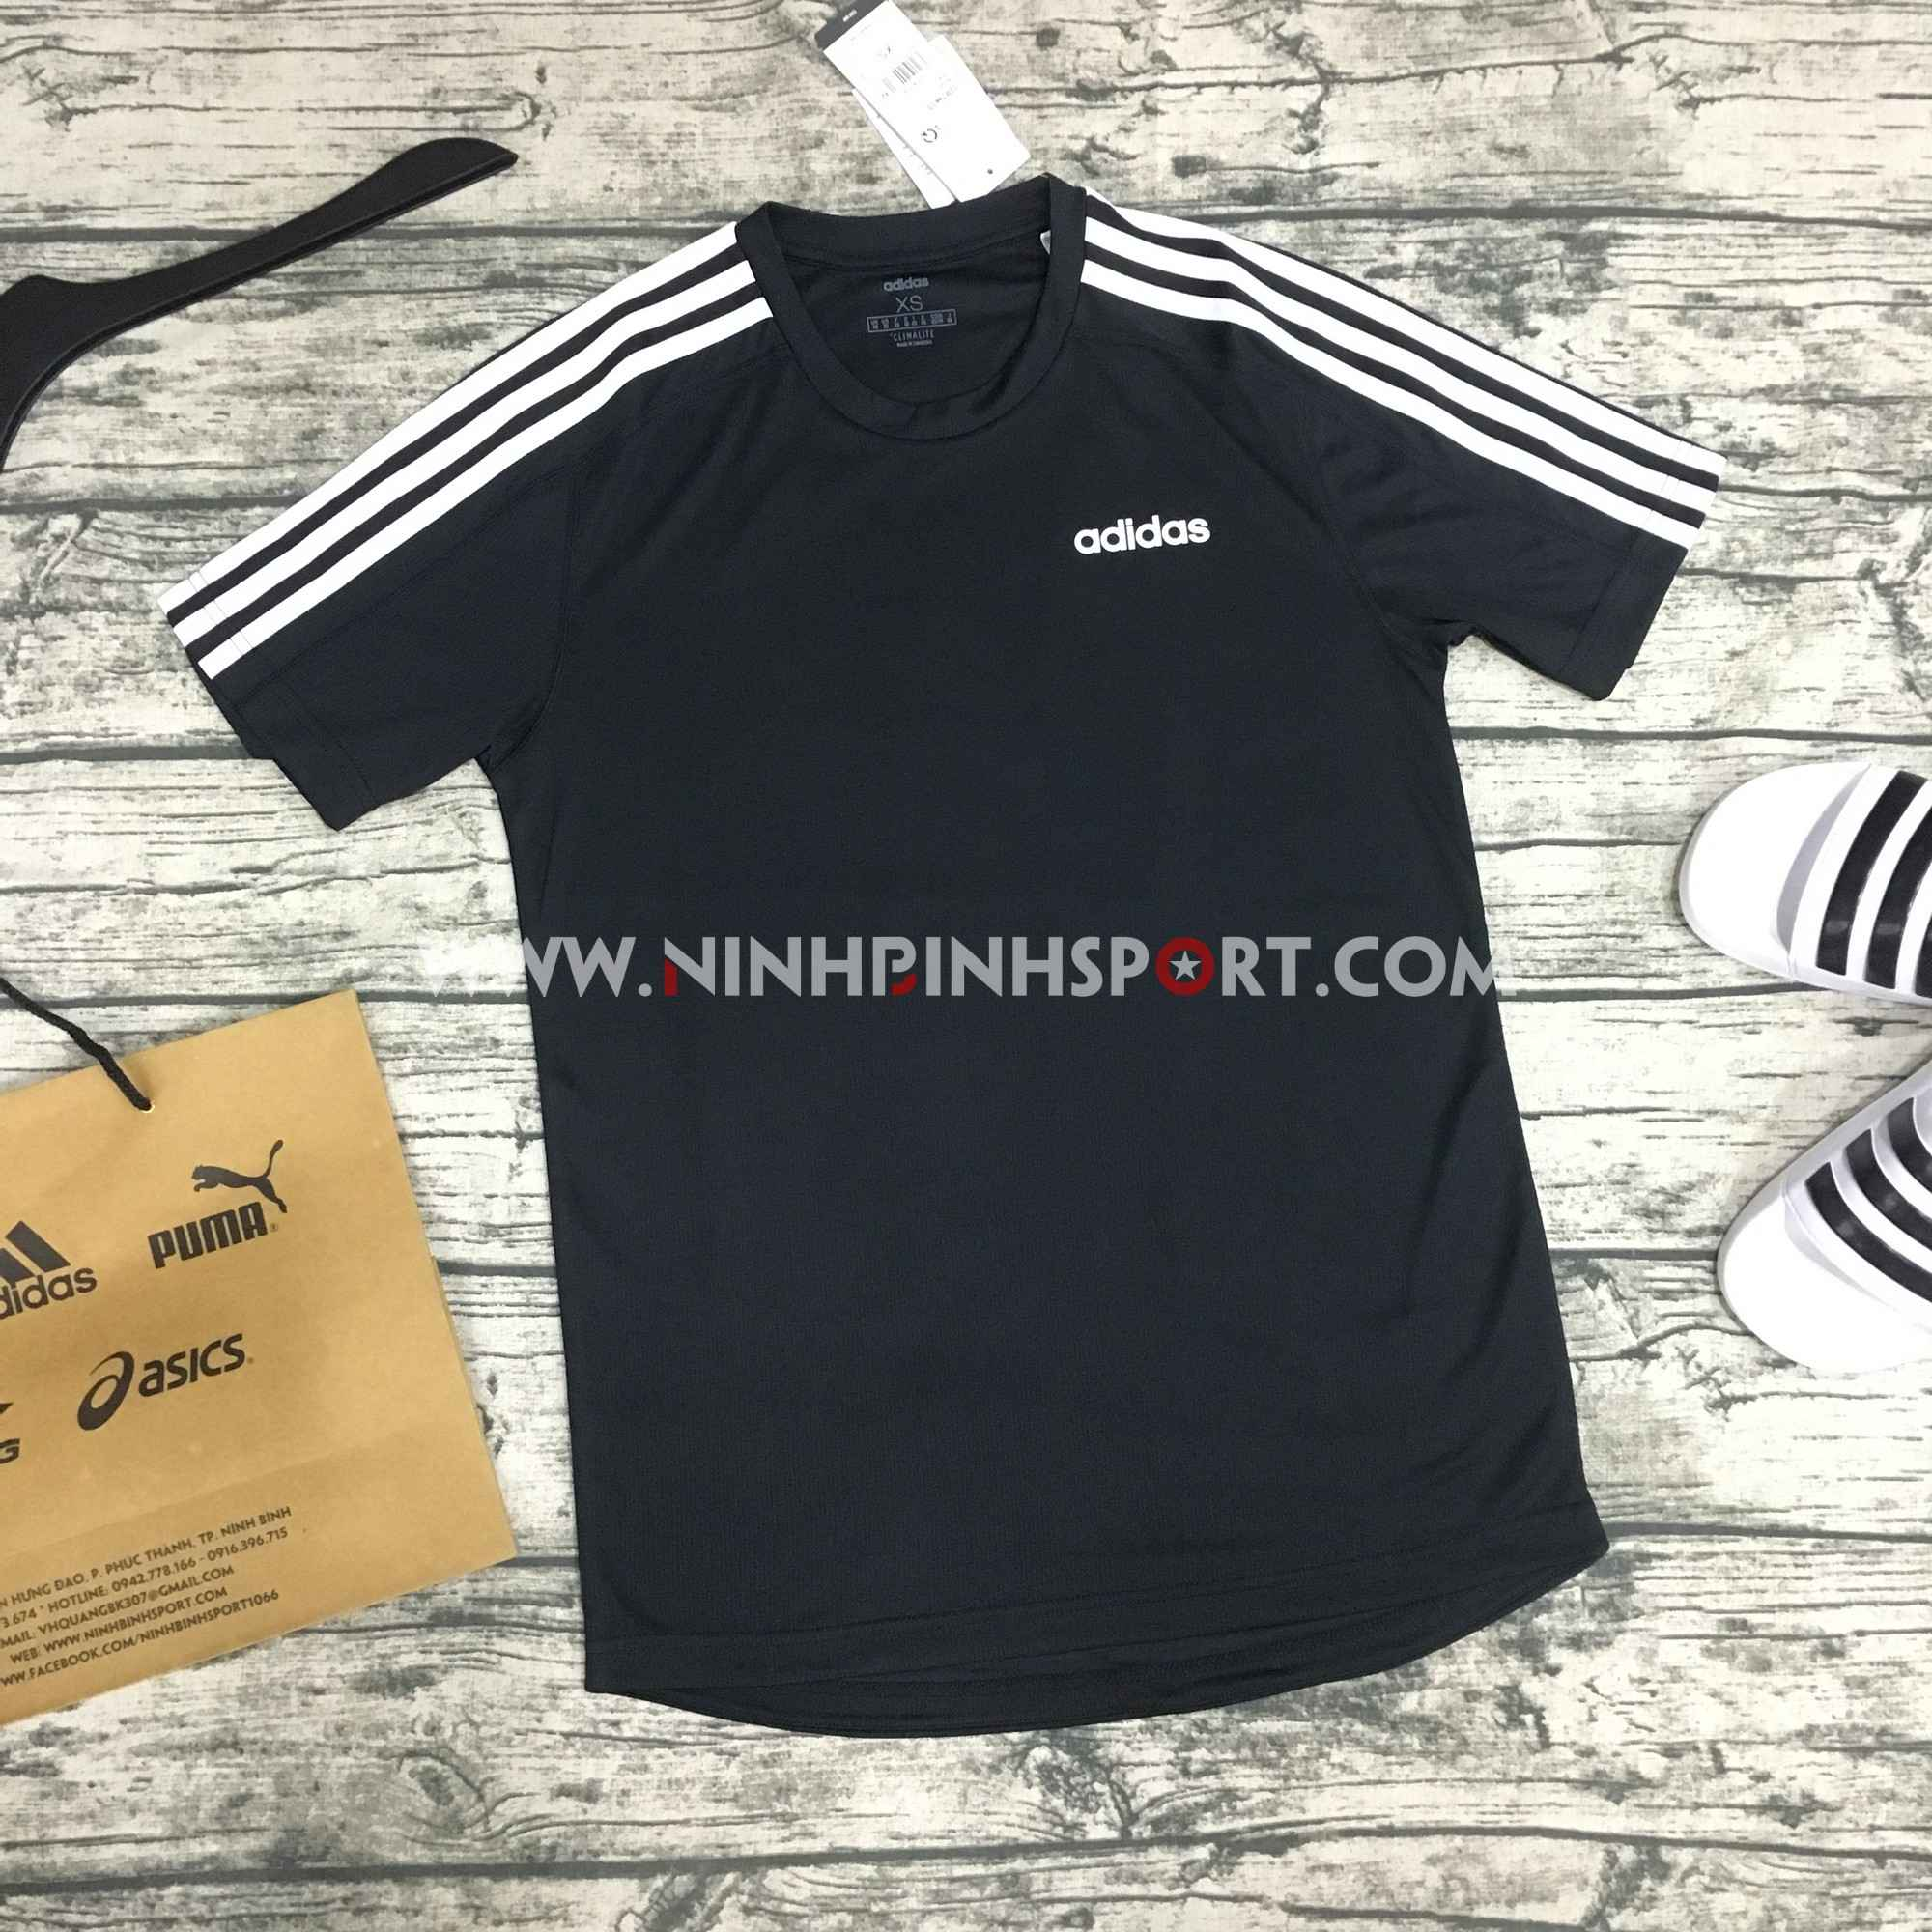 Áo thể thao nam Adidas Design 2 Move 3-Stripes Tee Black DT3043